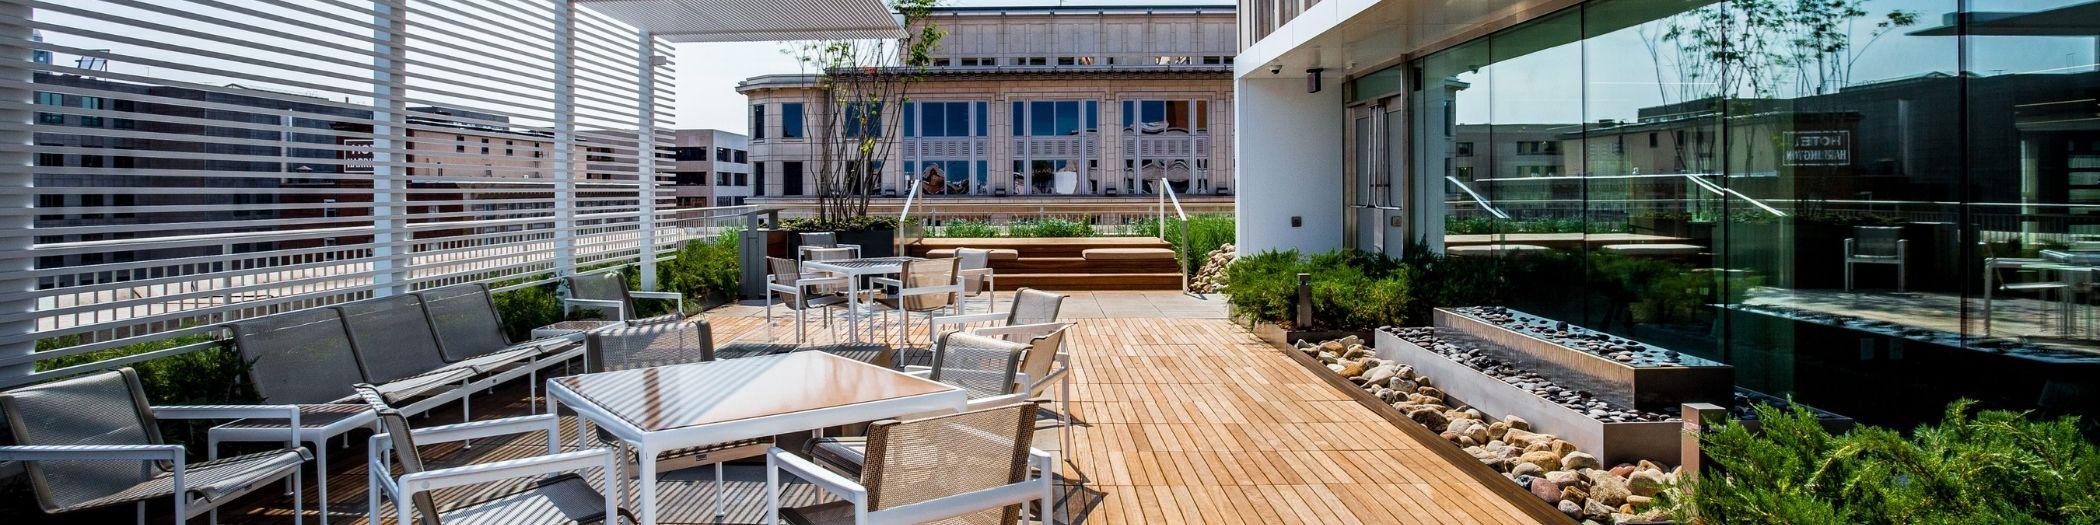 complete landscaping services PORTFOLIO OFFICE BUILDINGS